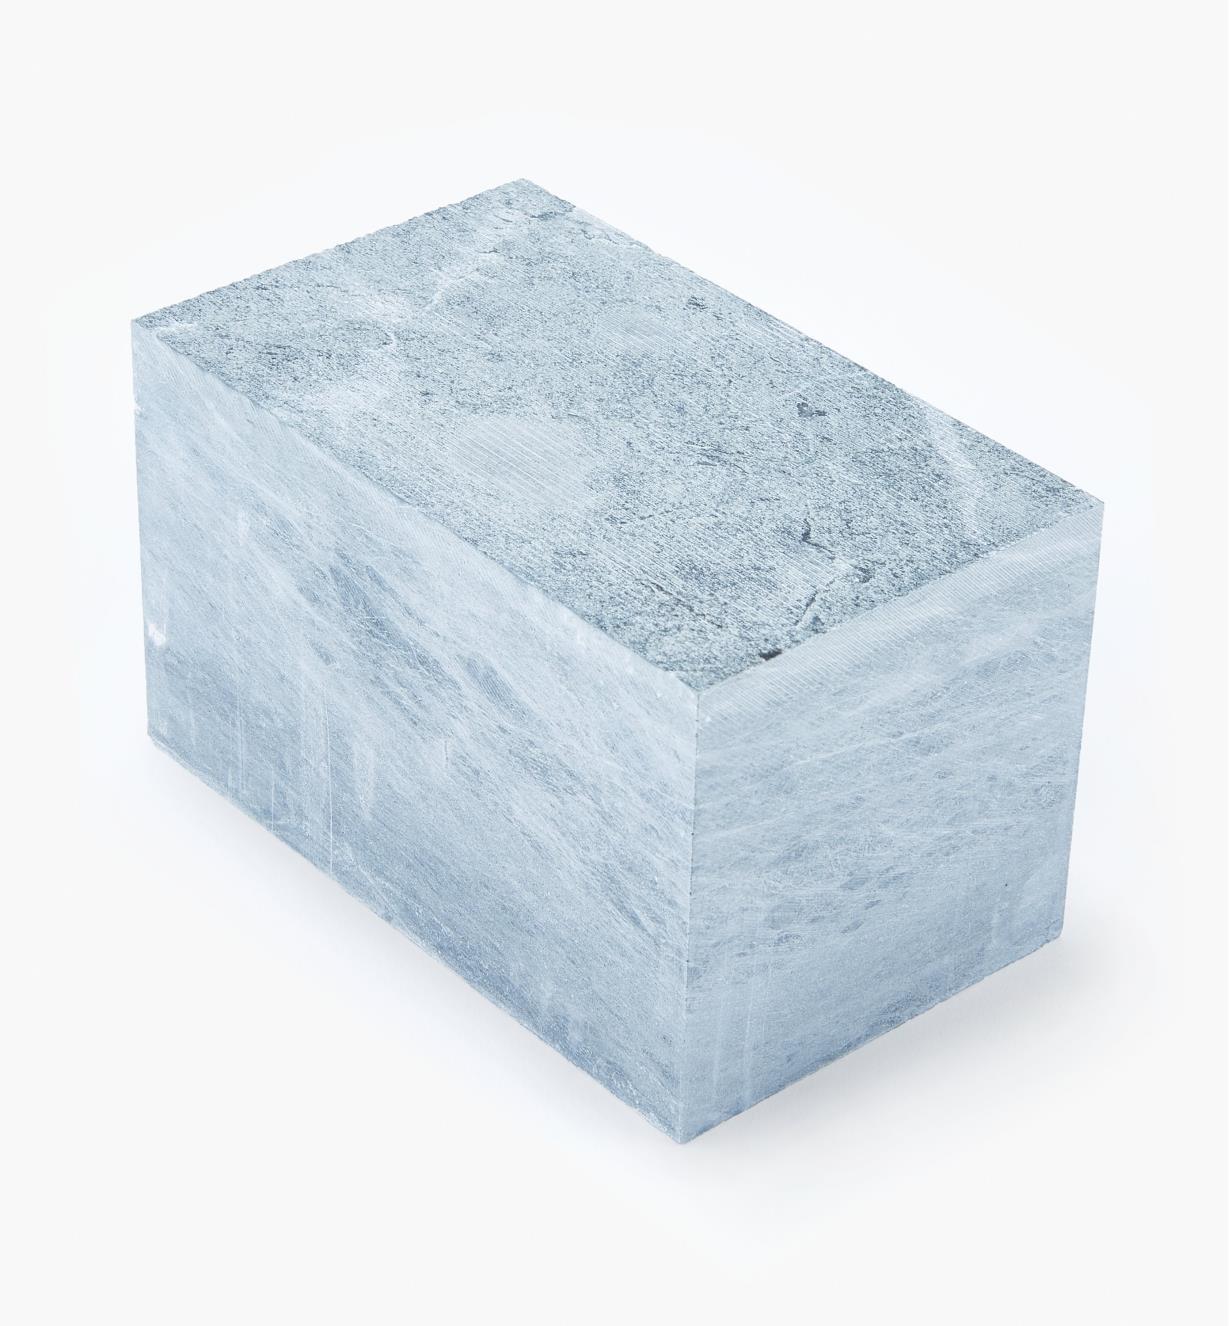 55K4001 - Bloc de pierre à savon, 3po x 3po x 5po